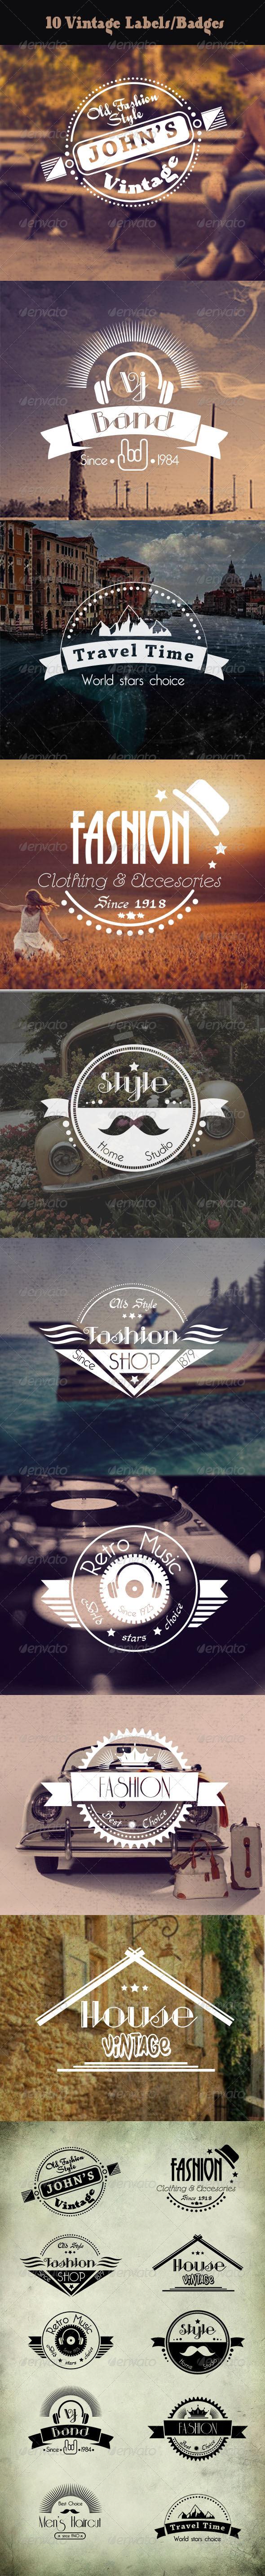 GraphicRiver Vintage Labels and Badges 7470846